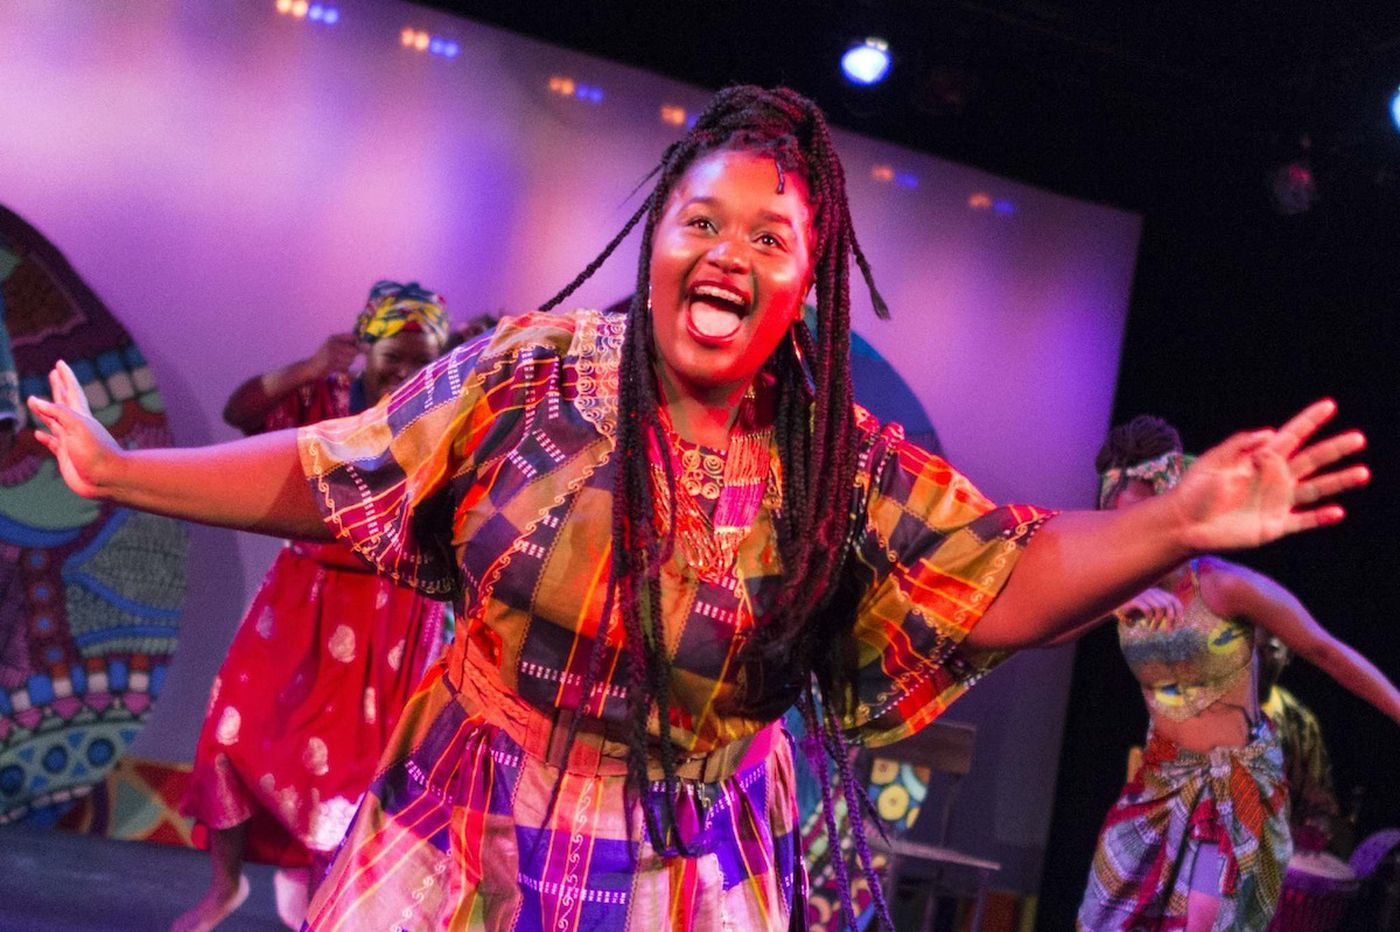 'Black Nativity' at Theatre Horizon: A vibrant, musical holiday blast